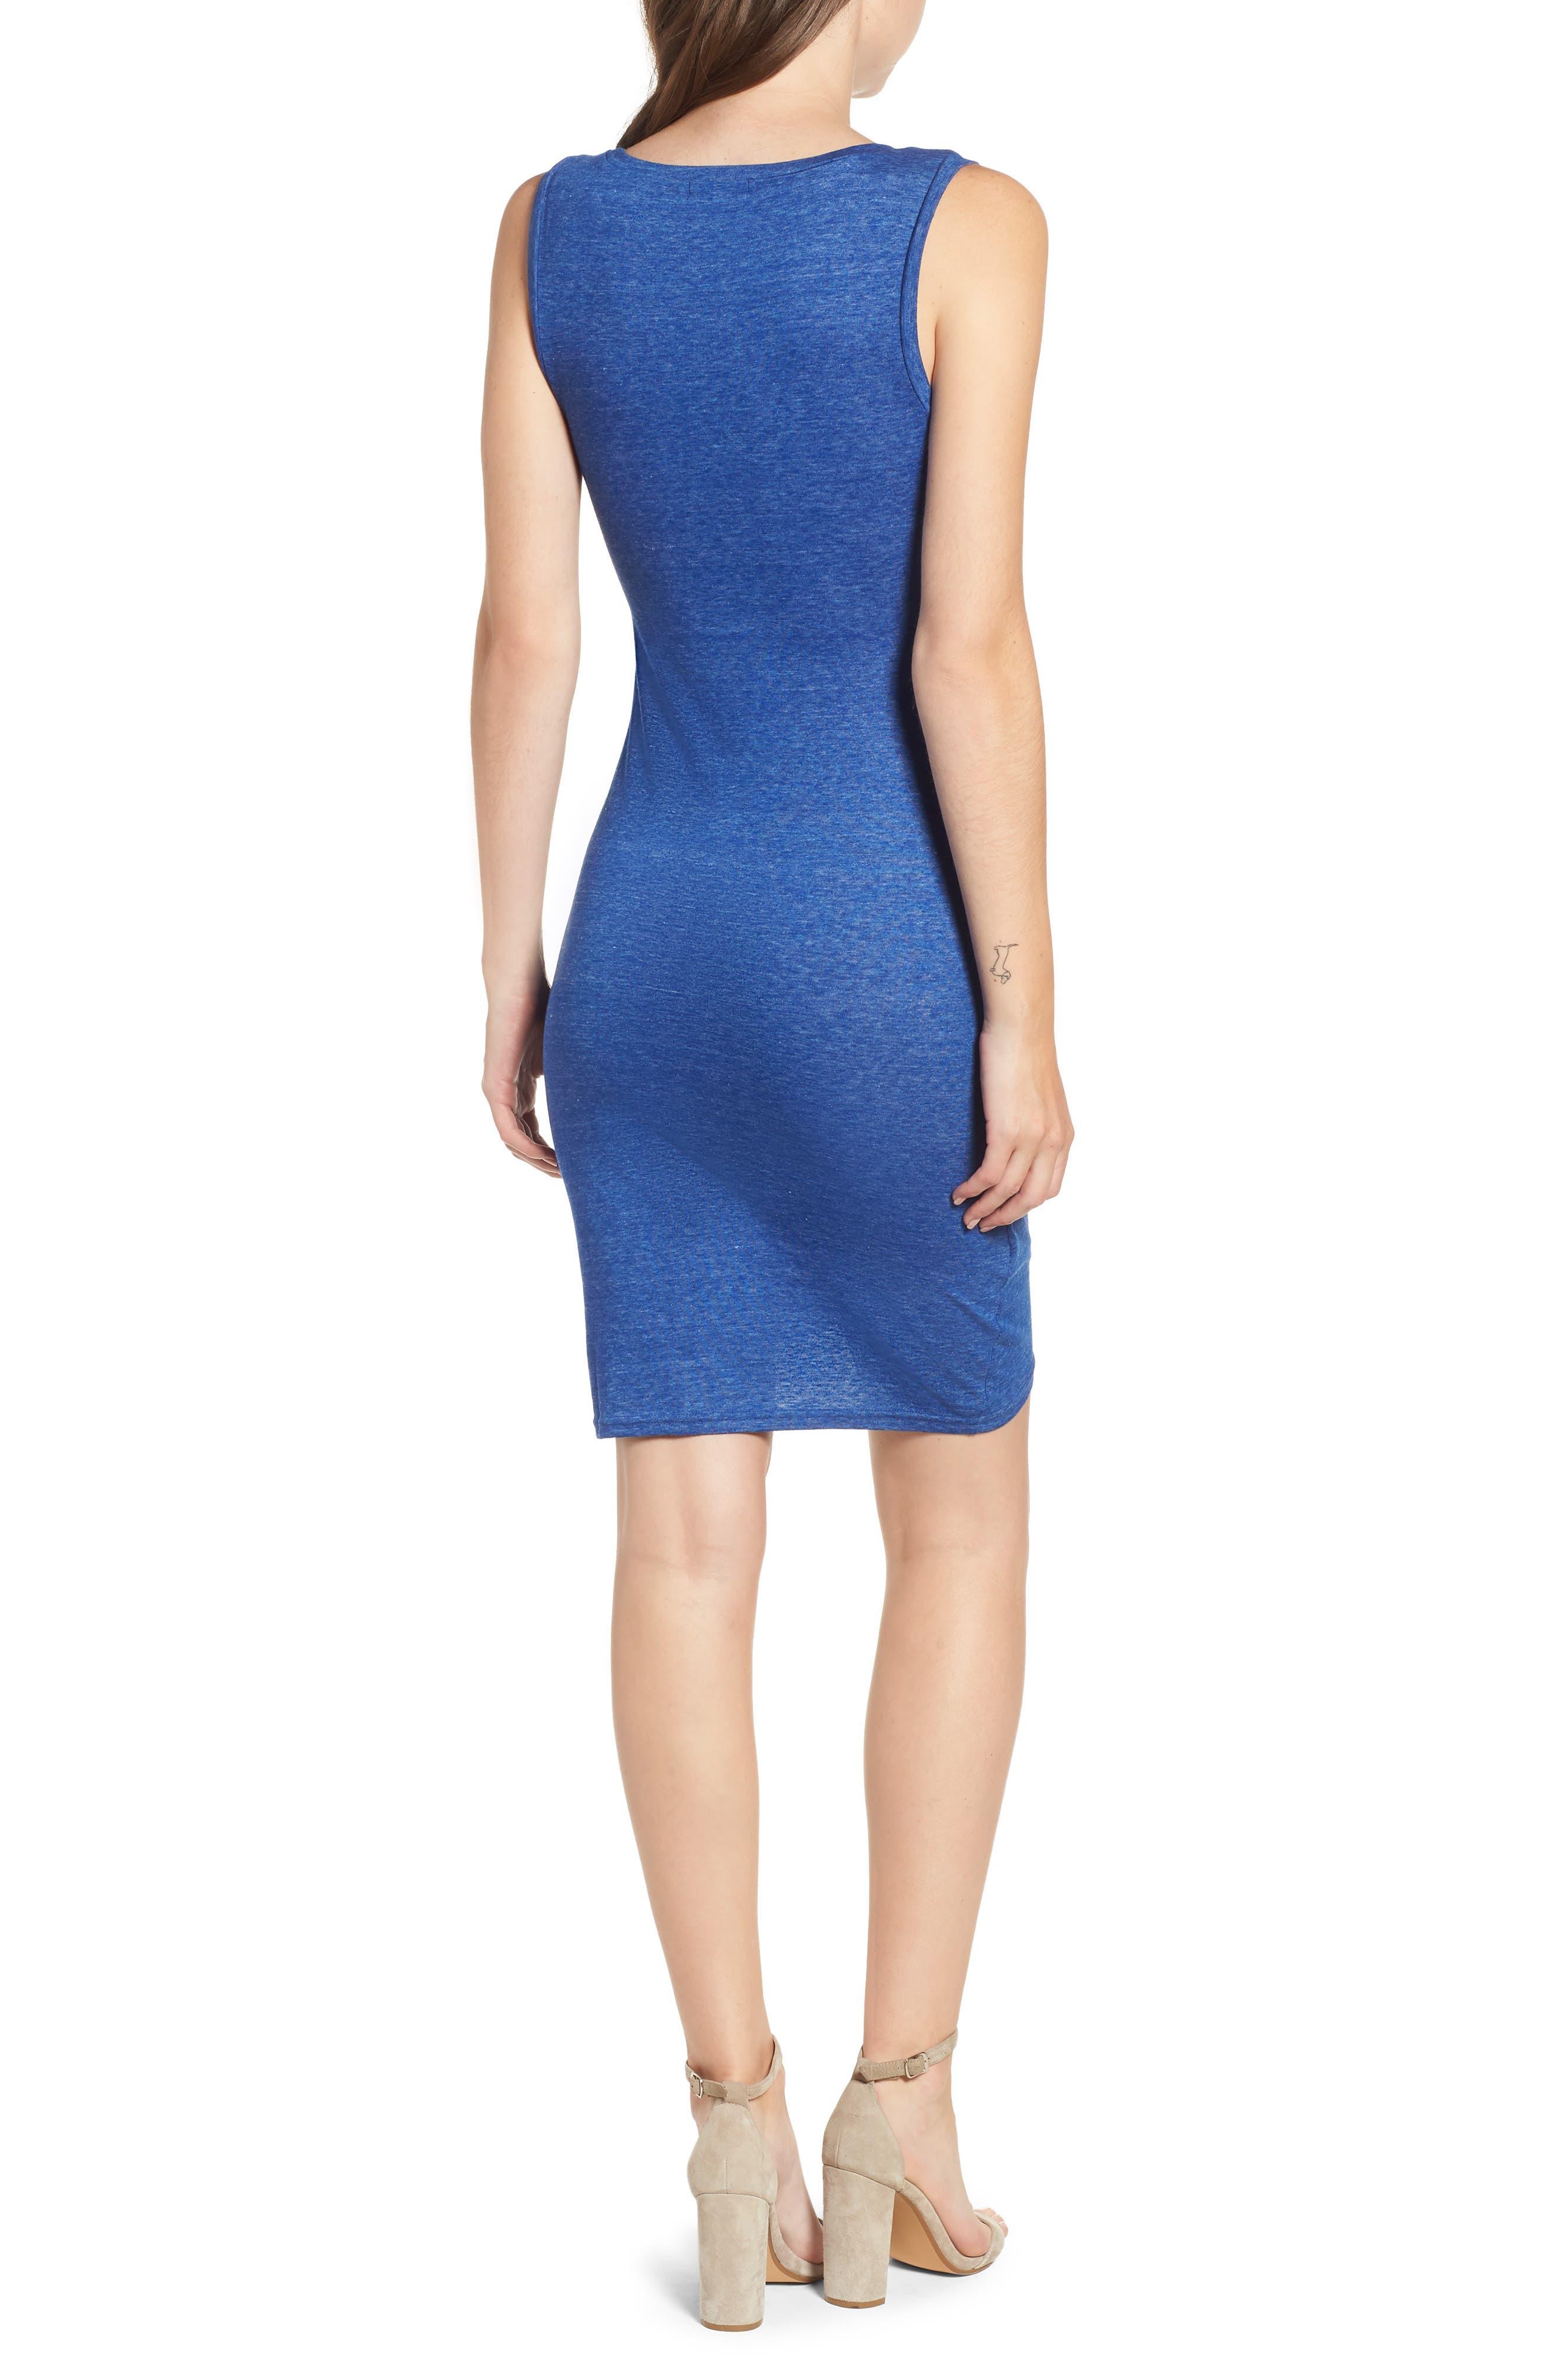 Ruched Body-Con Tank Dress,                             Alternate thumbnail 2, color,                             Blue Mazarine Hthr